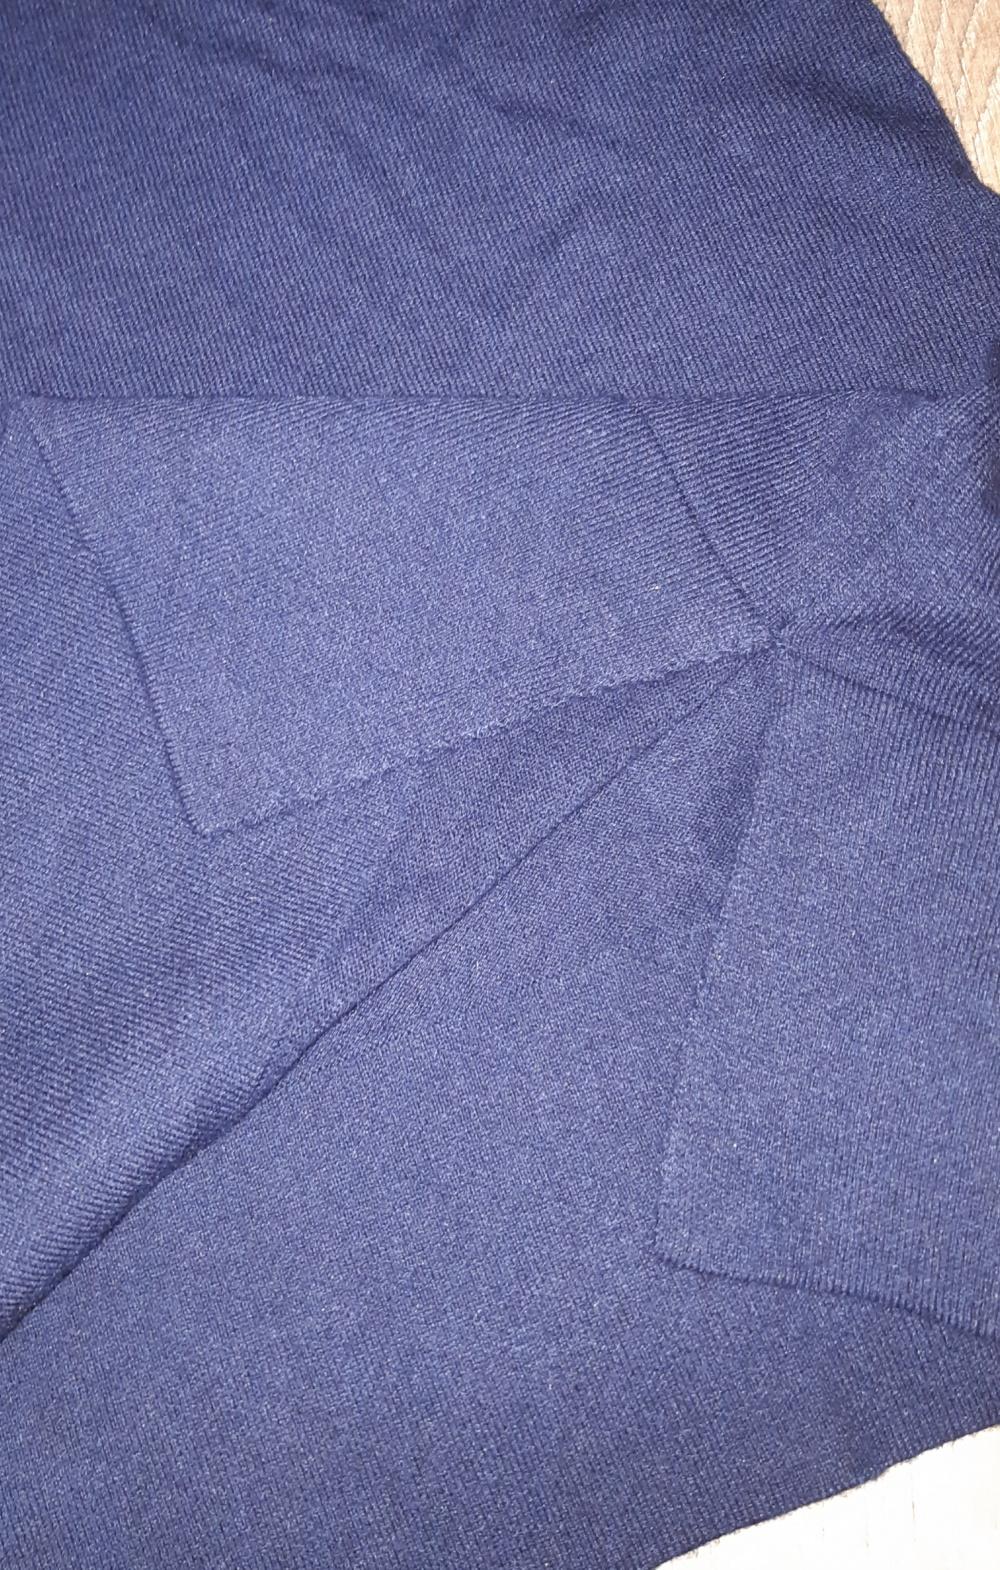 Новая водолазка violeta by mango, размер 46+-